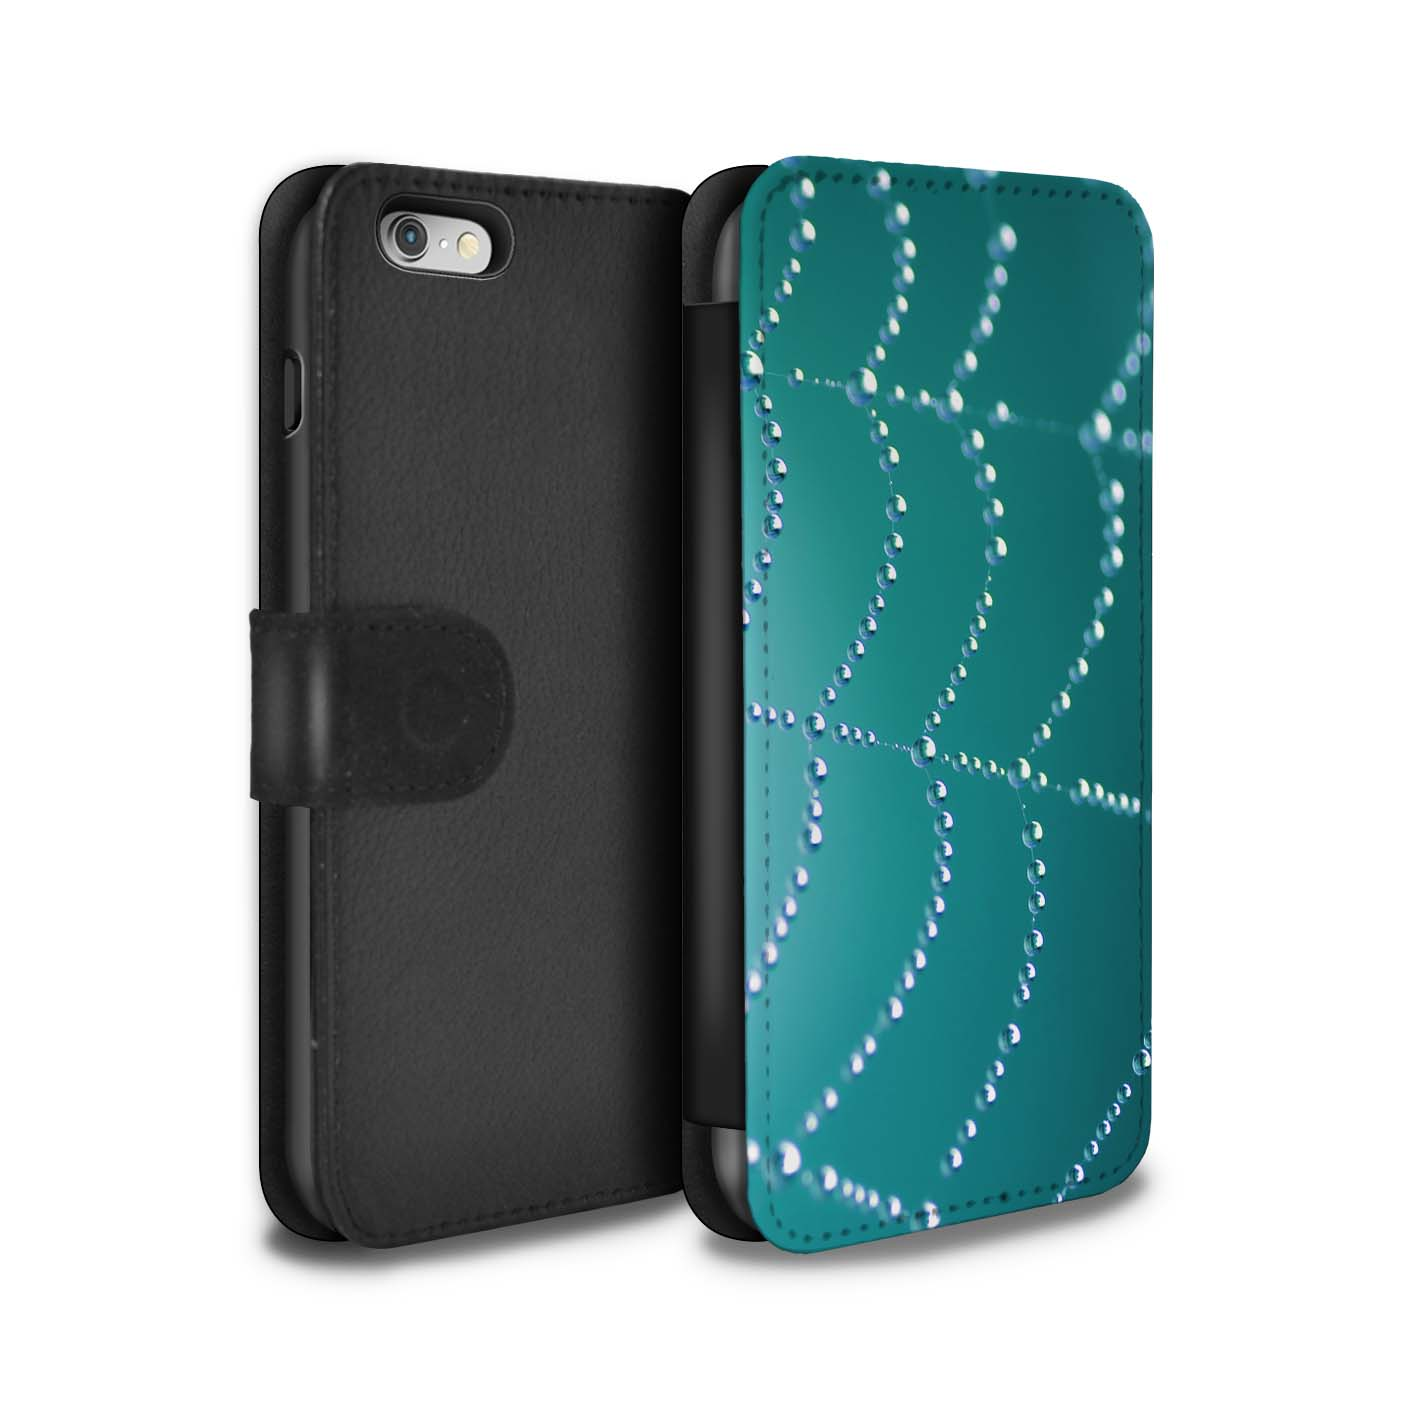 STUFF4-Coque-Etui-Case-Cuir-PU-pour-Apple-iPhone-6-Toile-d-039-araignee-Perles